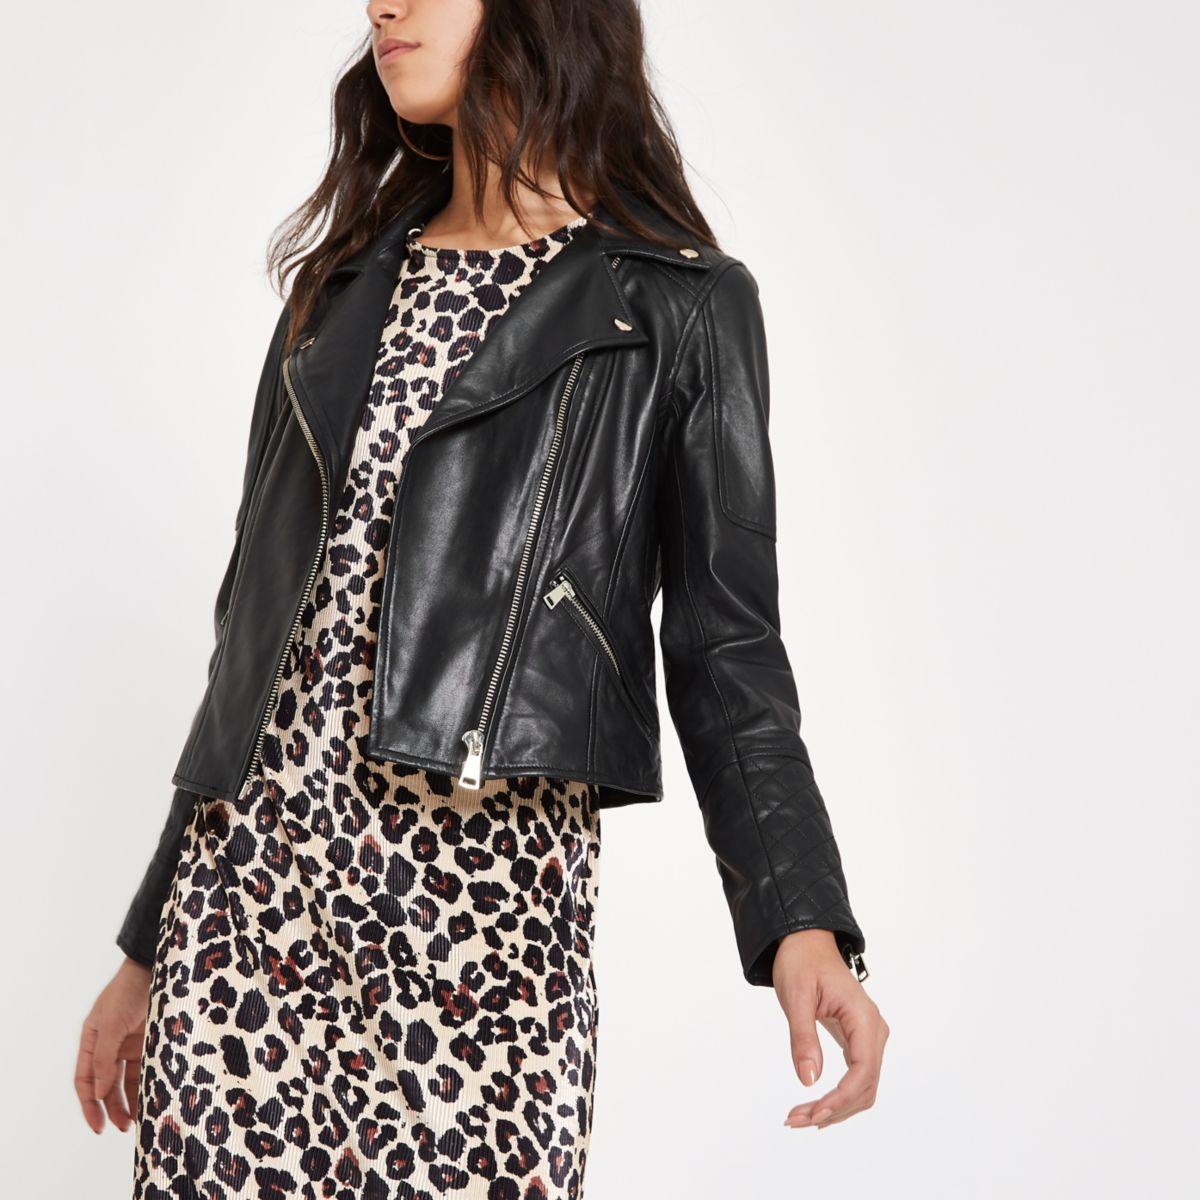 Black leather fitted biker jacket